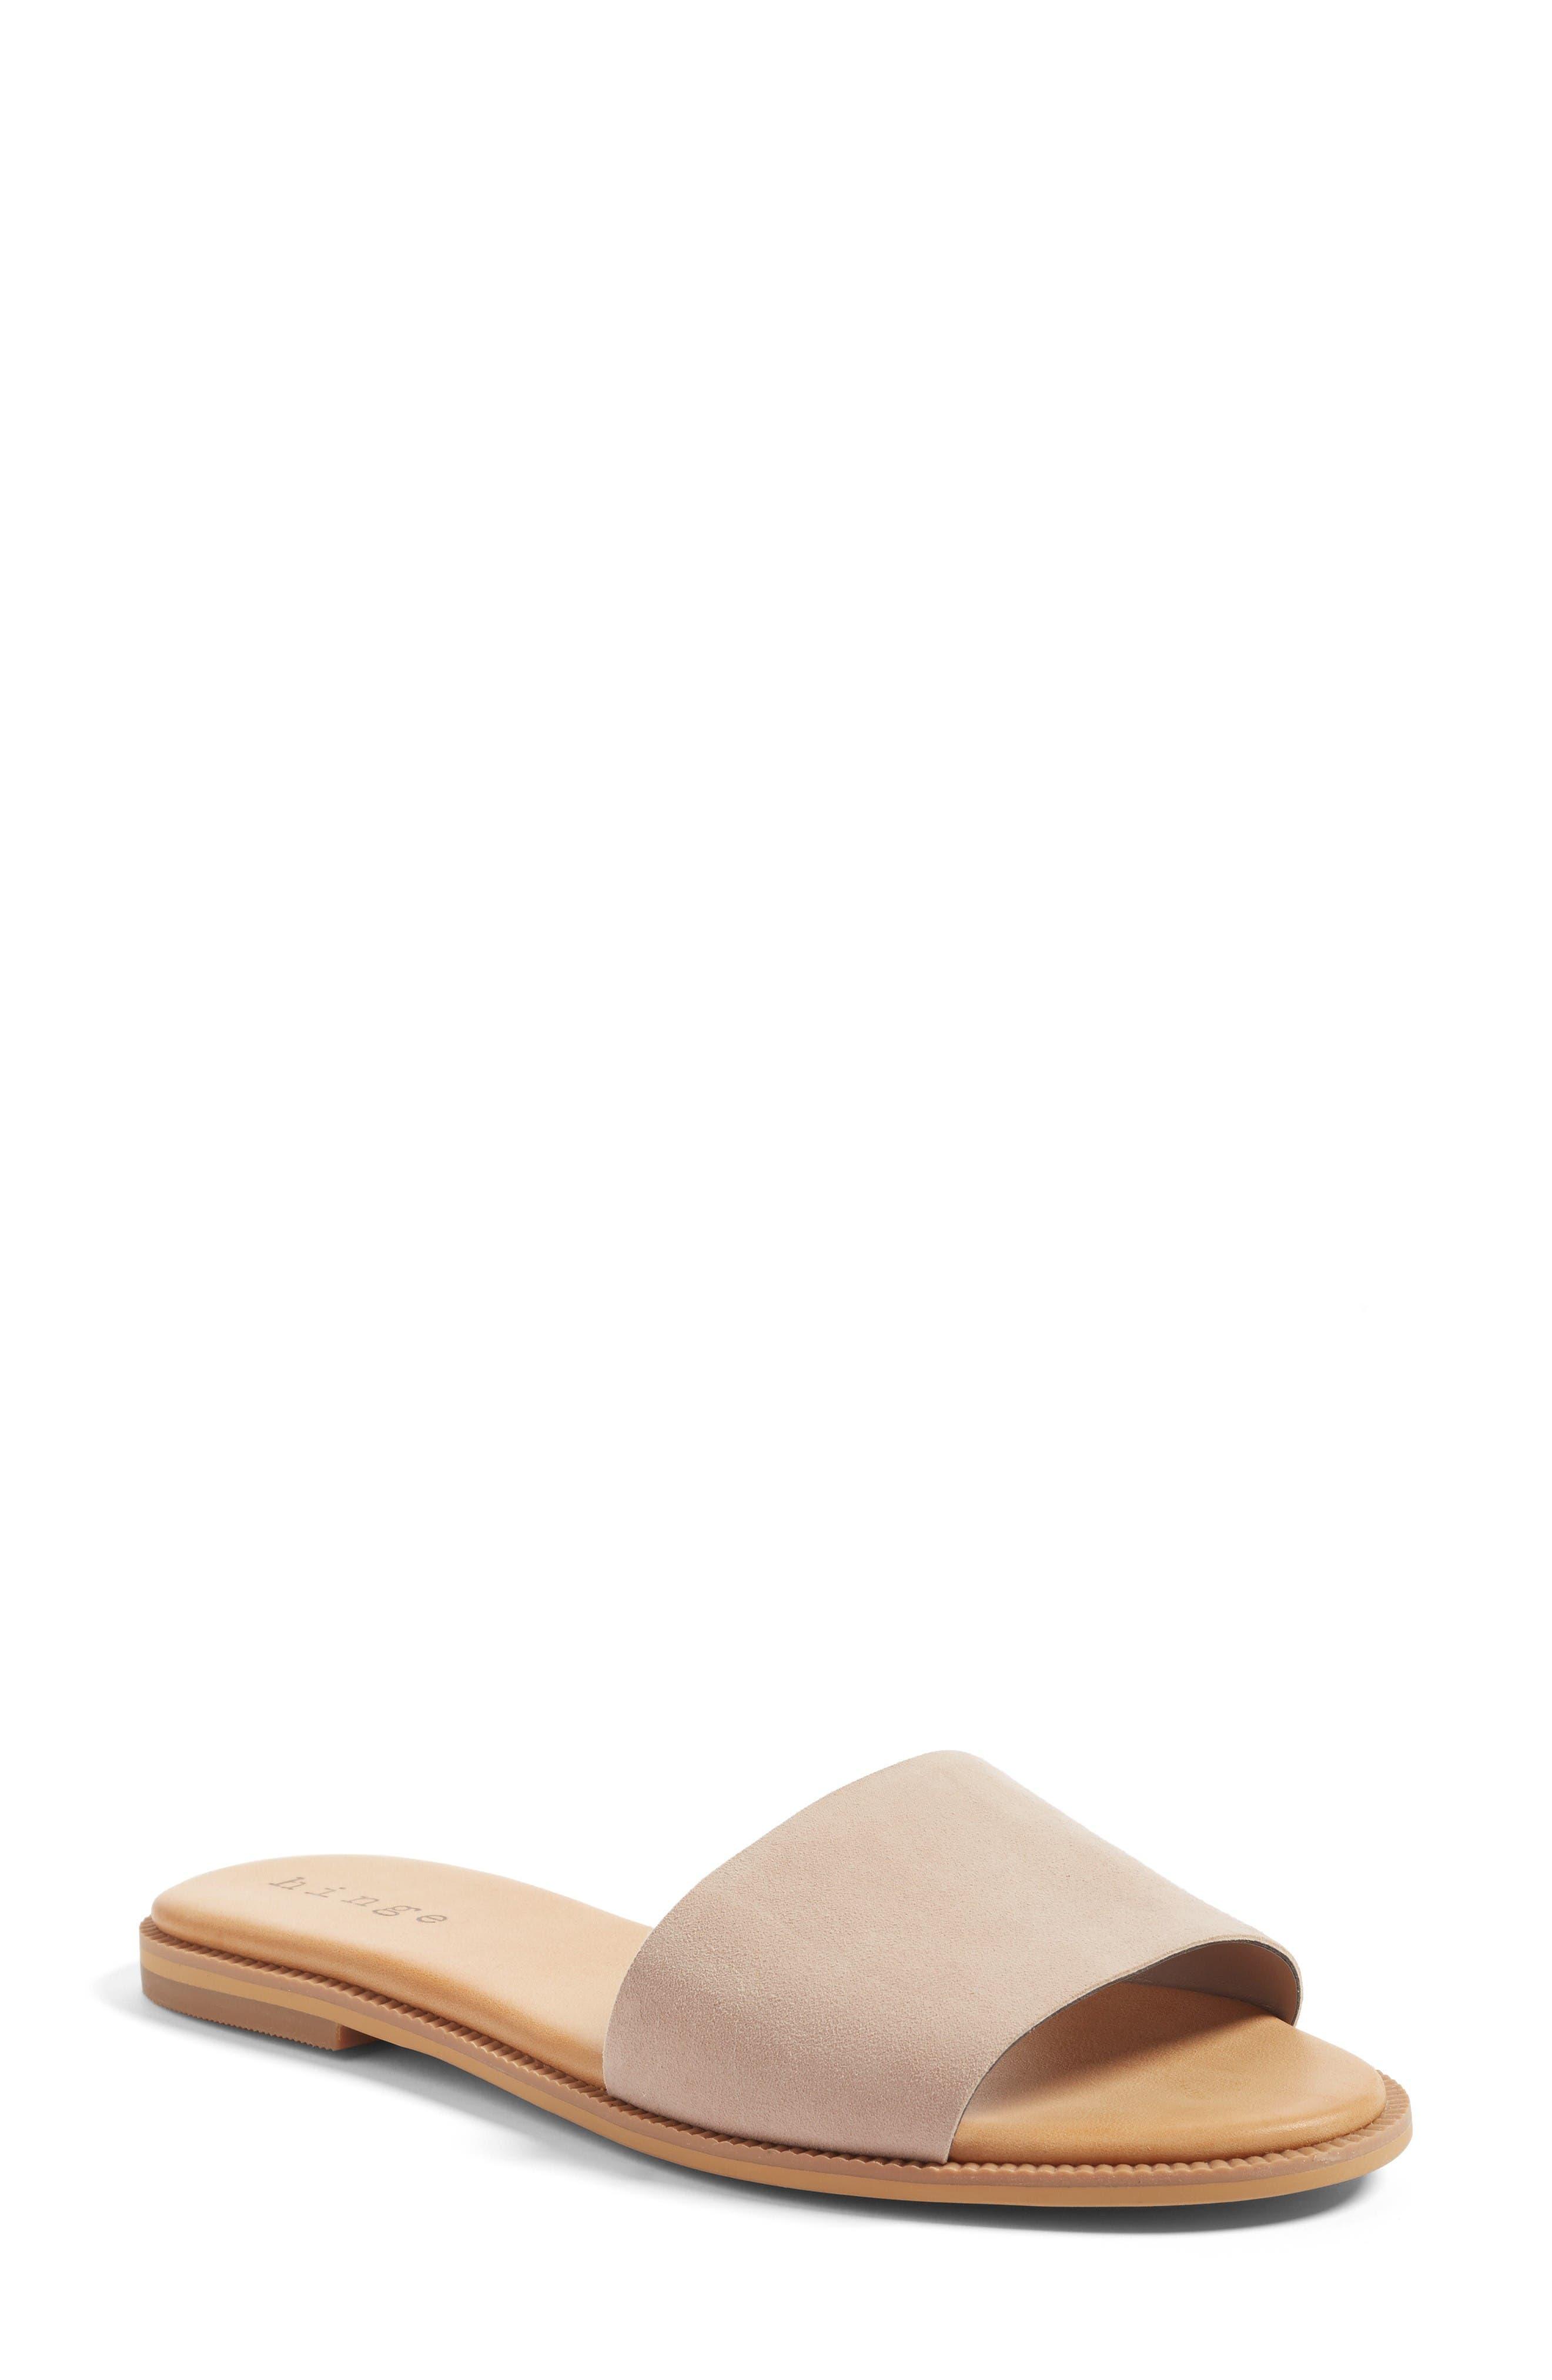 Alternate Image 1 Selected - Hinge 'Mere' Flat Slide Sandal (Women)